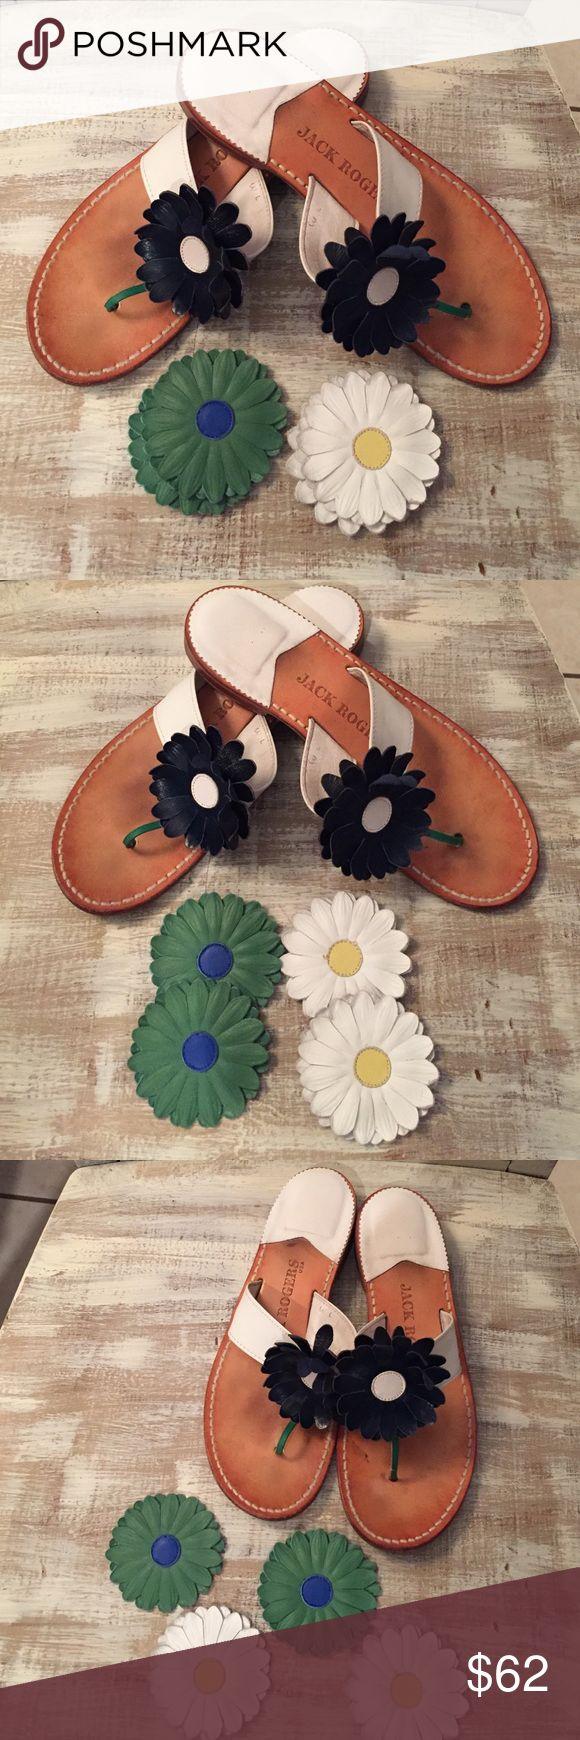 "JACK ROGERS Women's DAISY Sandals. Women's Jack Rogers Daisy Leather Sandals with two sets of ""New"" interchangeable Daisy's. Jack Rogers Shoes Sandals"